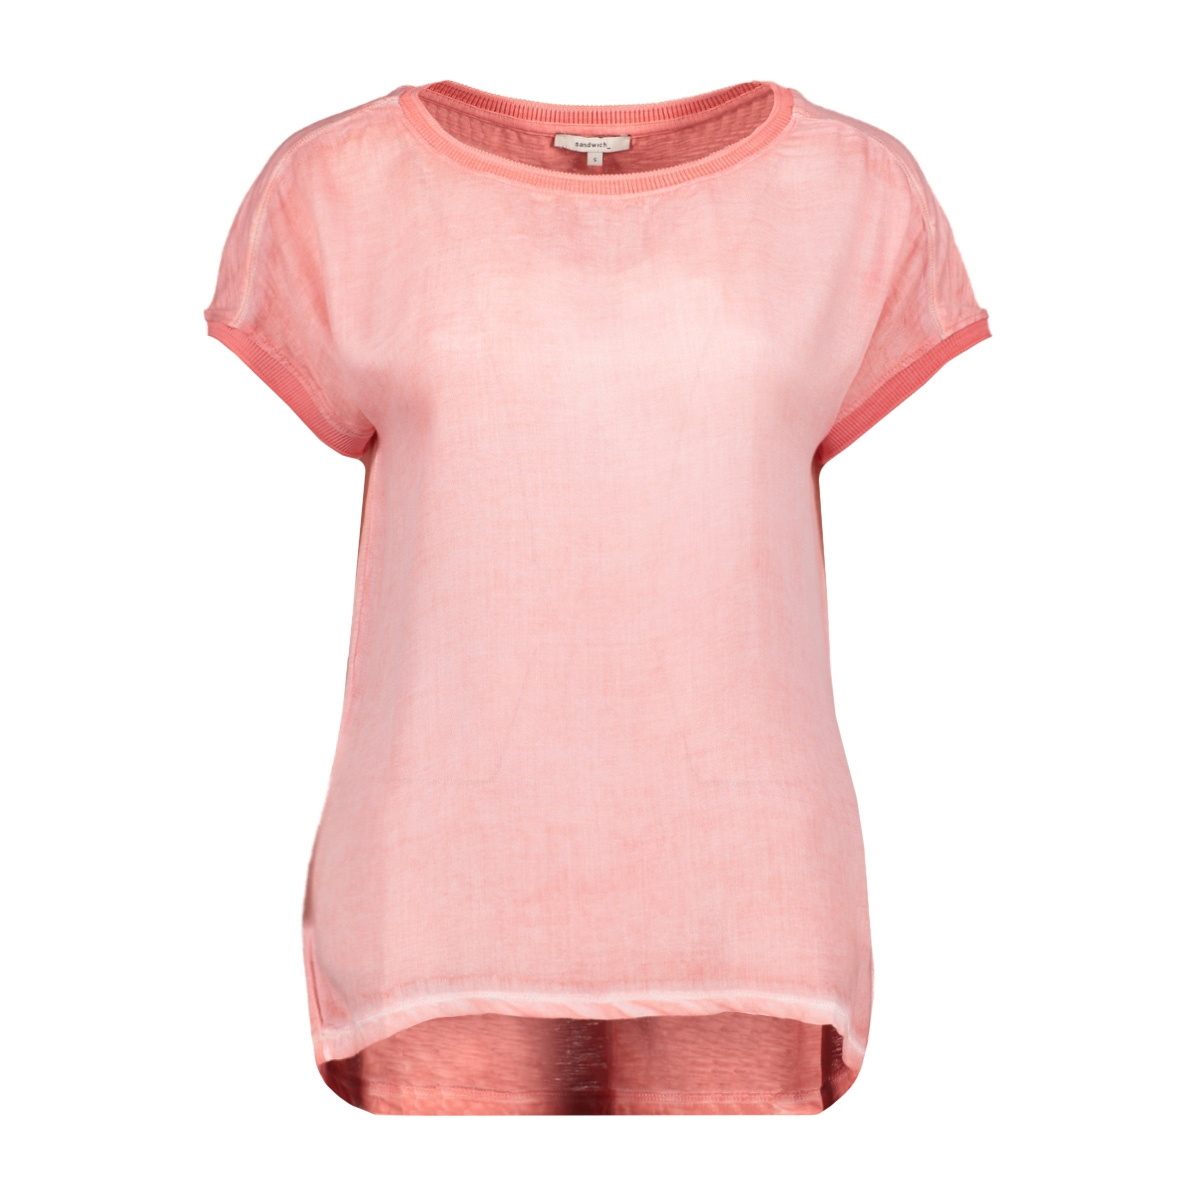 viscose t shirt met subtiele details 21101832 sandwich t-shirt 20139